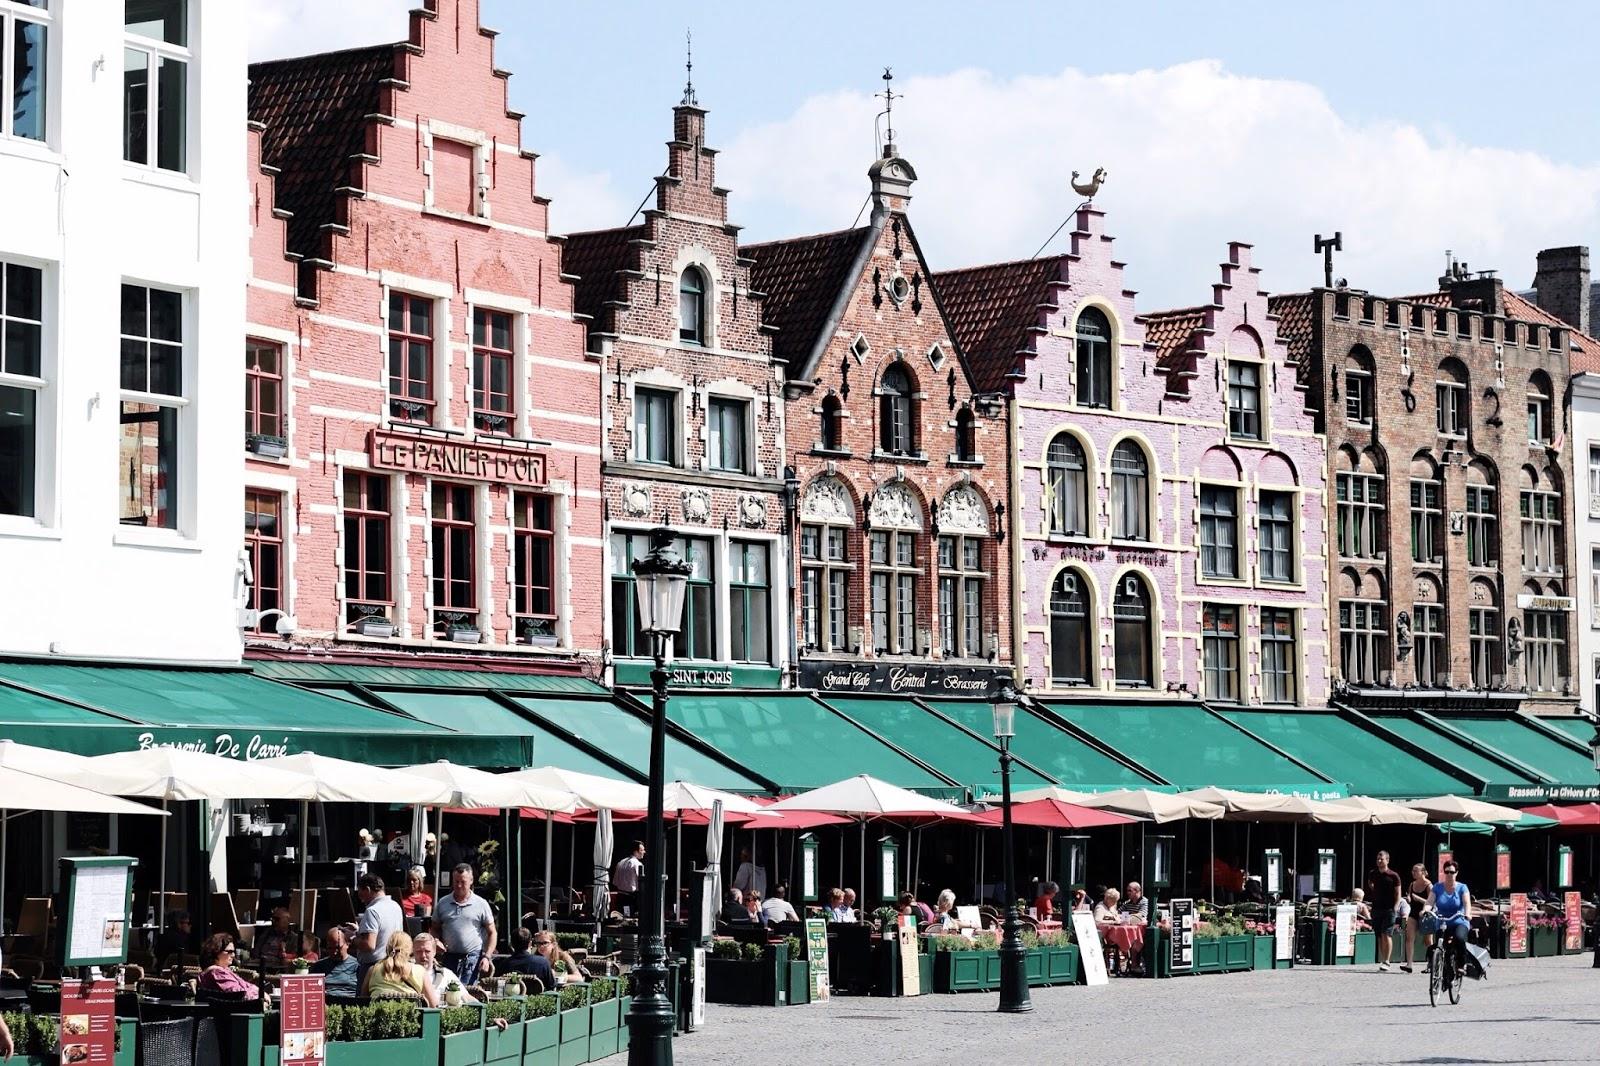 Chocolate Box Houses in Belgium